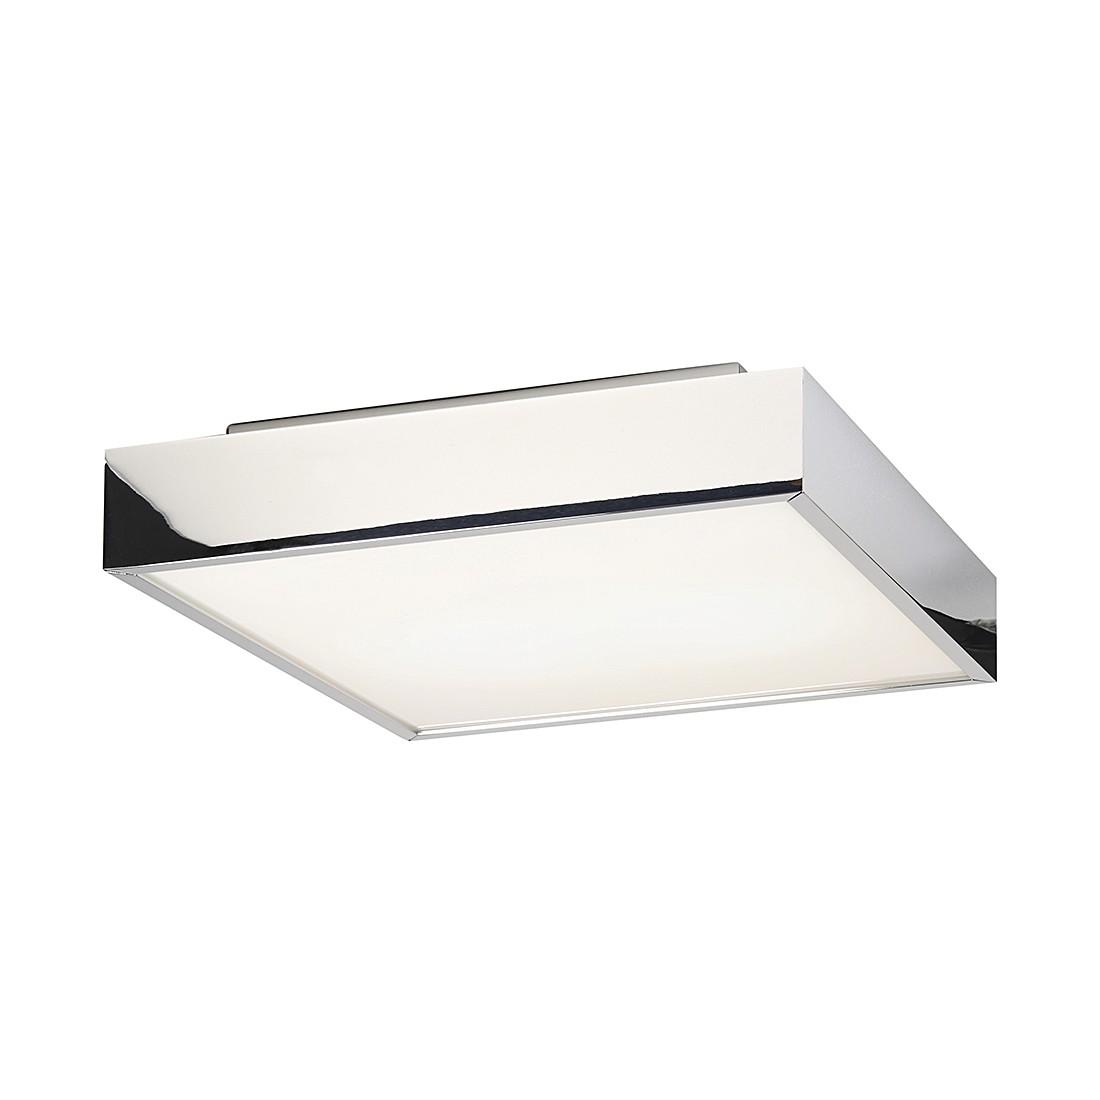 wandleuchte taketa 1 flammig illumina a g nstig online kaufen. Black Bedroom Furniture Sets. Home Design Ideas